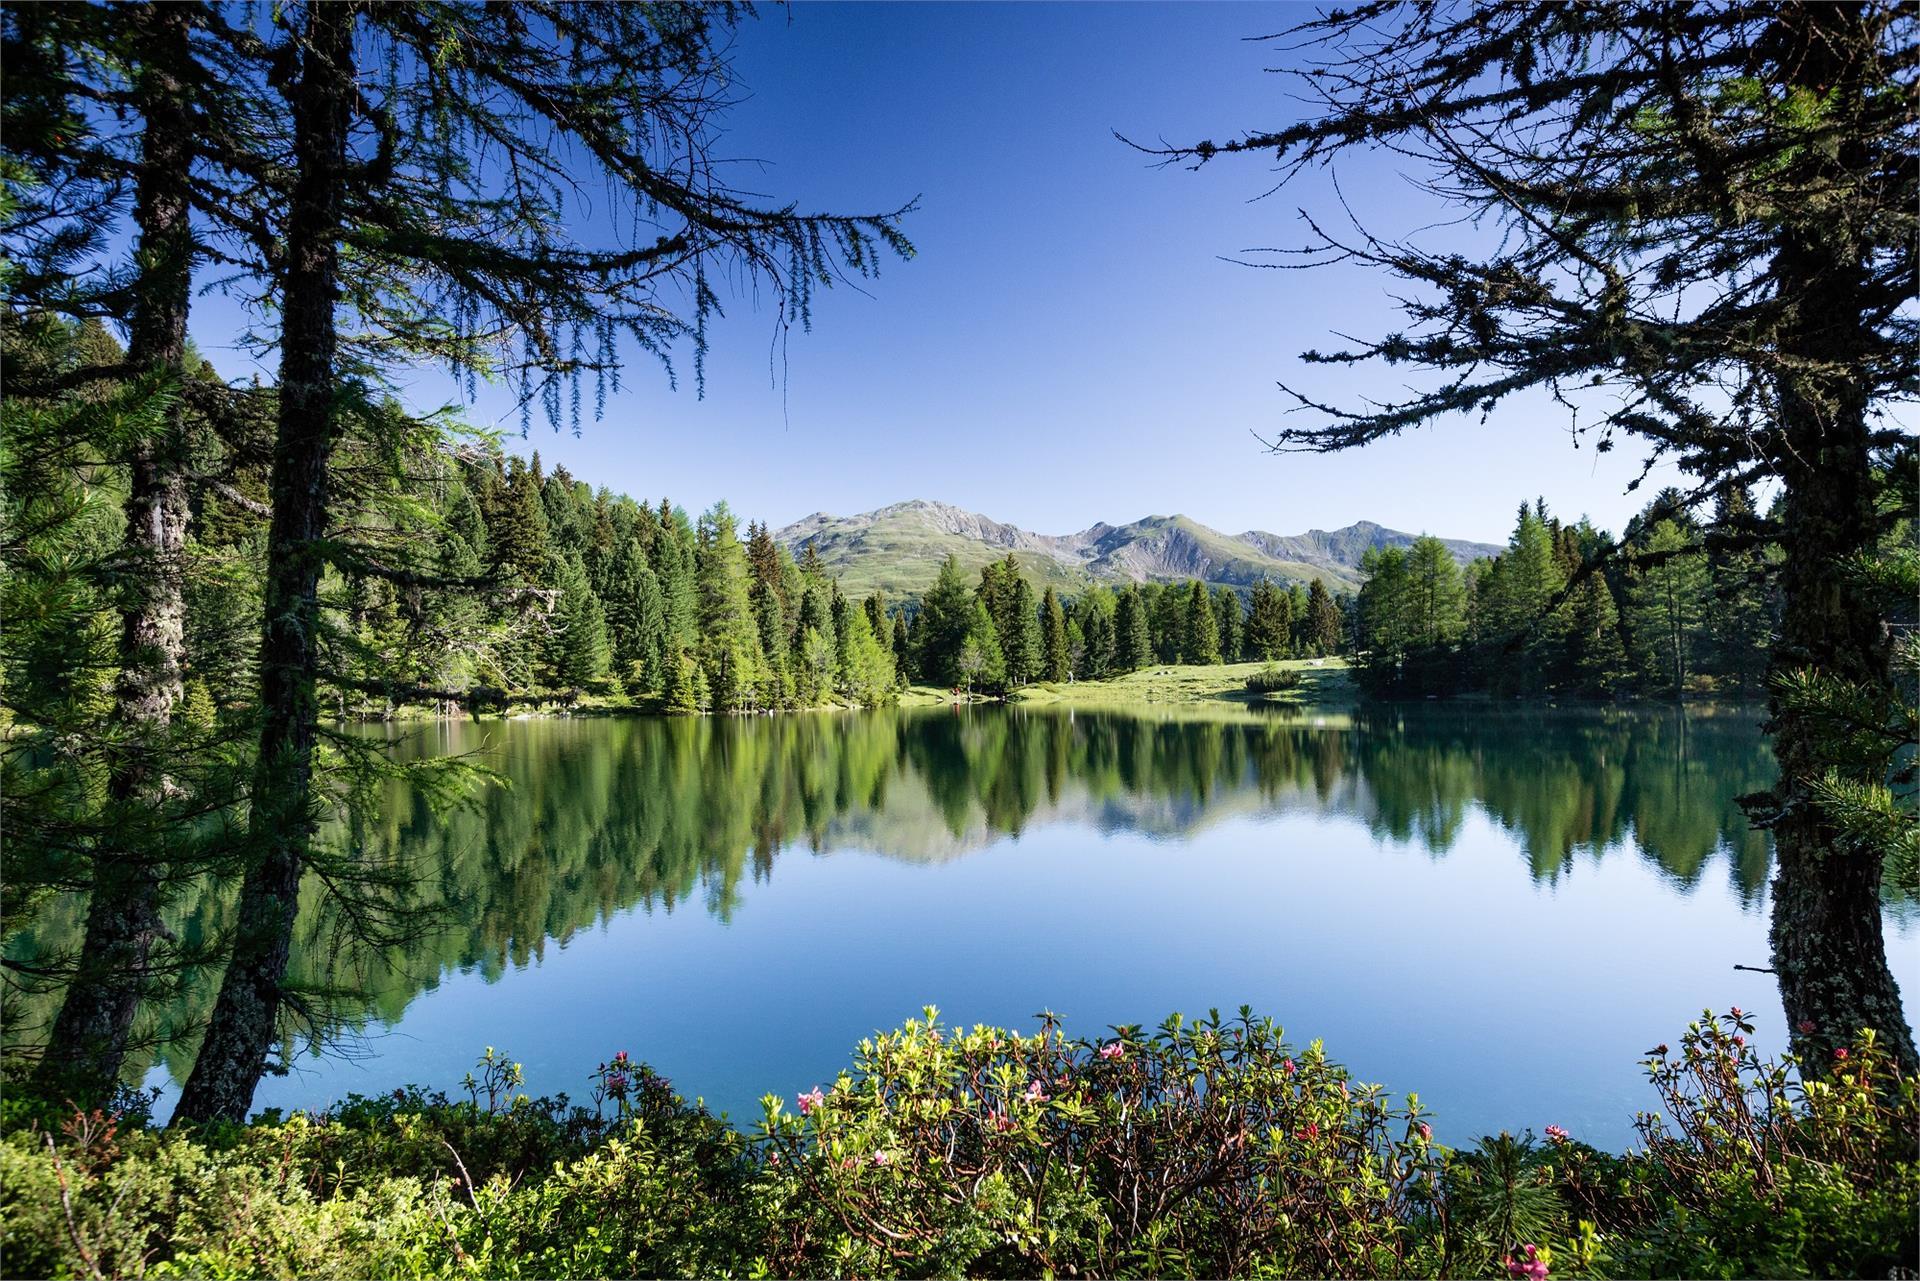 From Schalders to the Schrüttenseen lakes